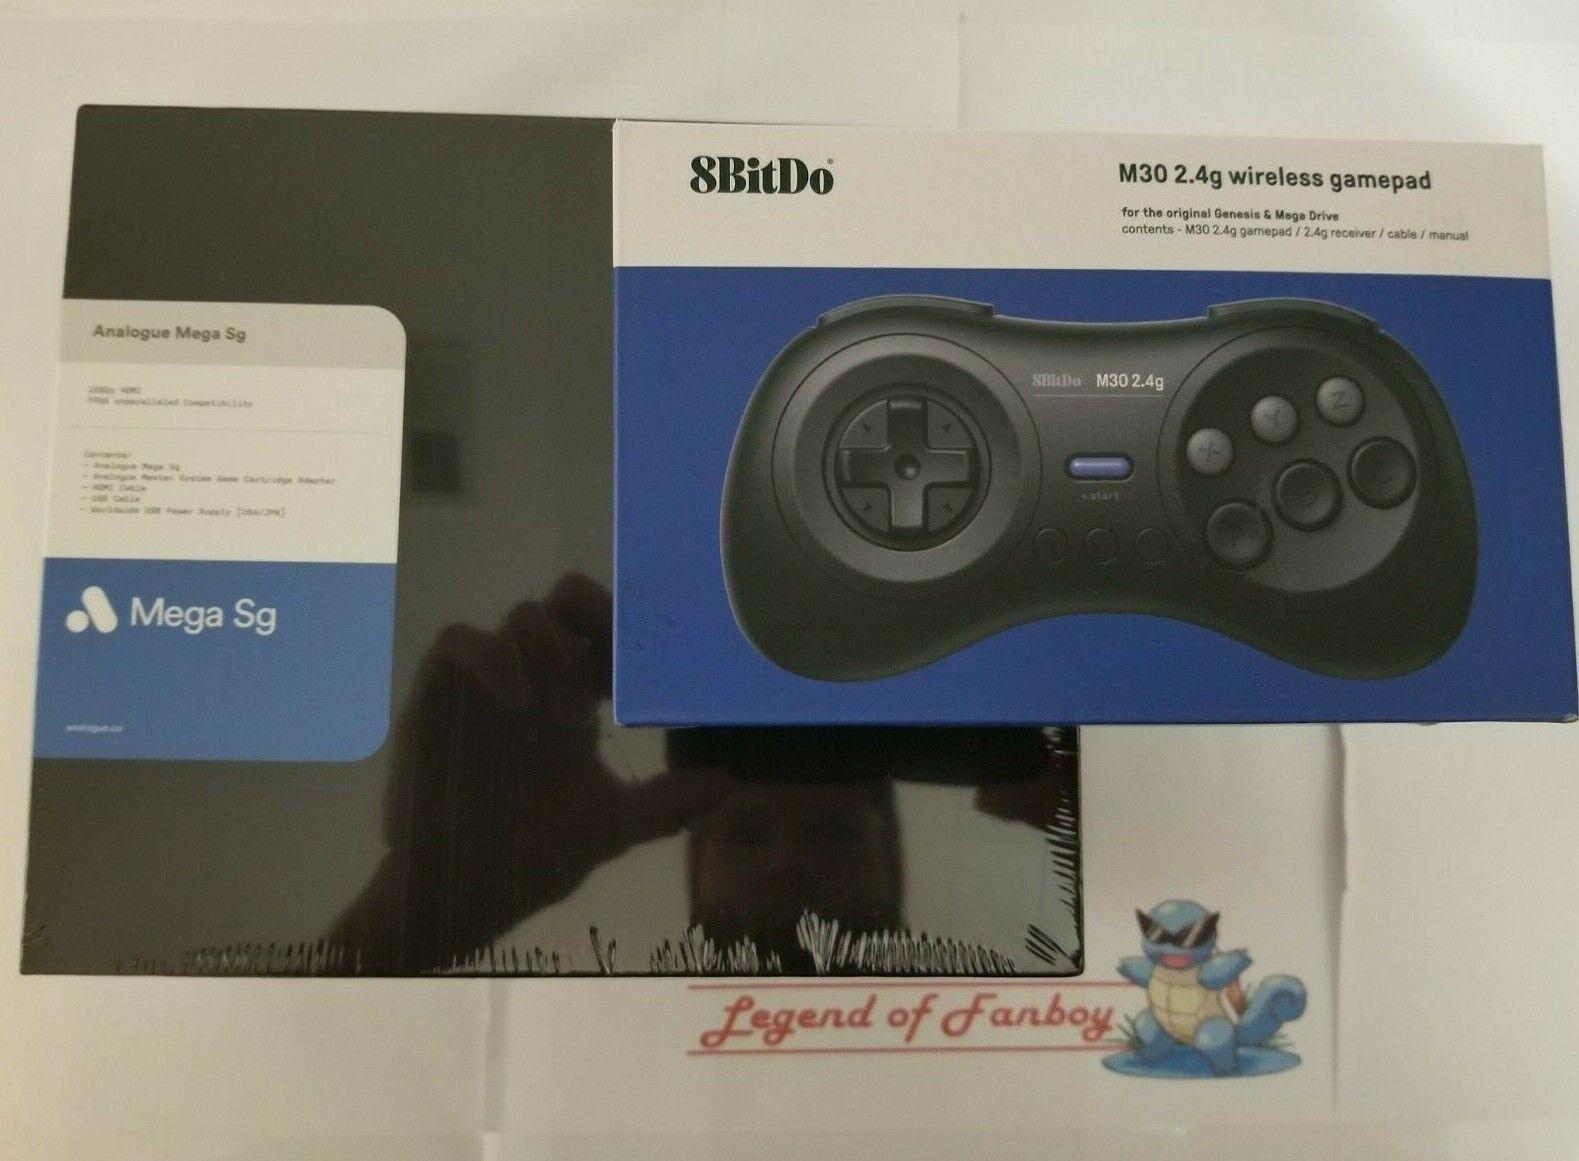 NEW * Analogue Mega SG Console USA Color + 8BitDo M30 controller - Sega Genesis